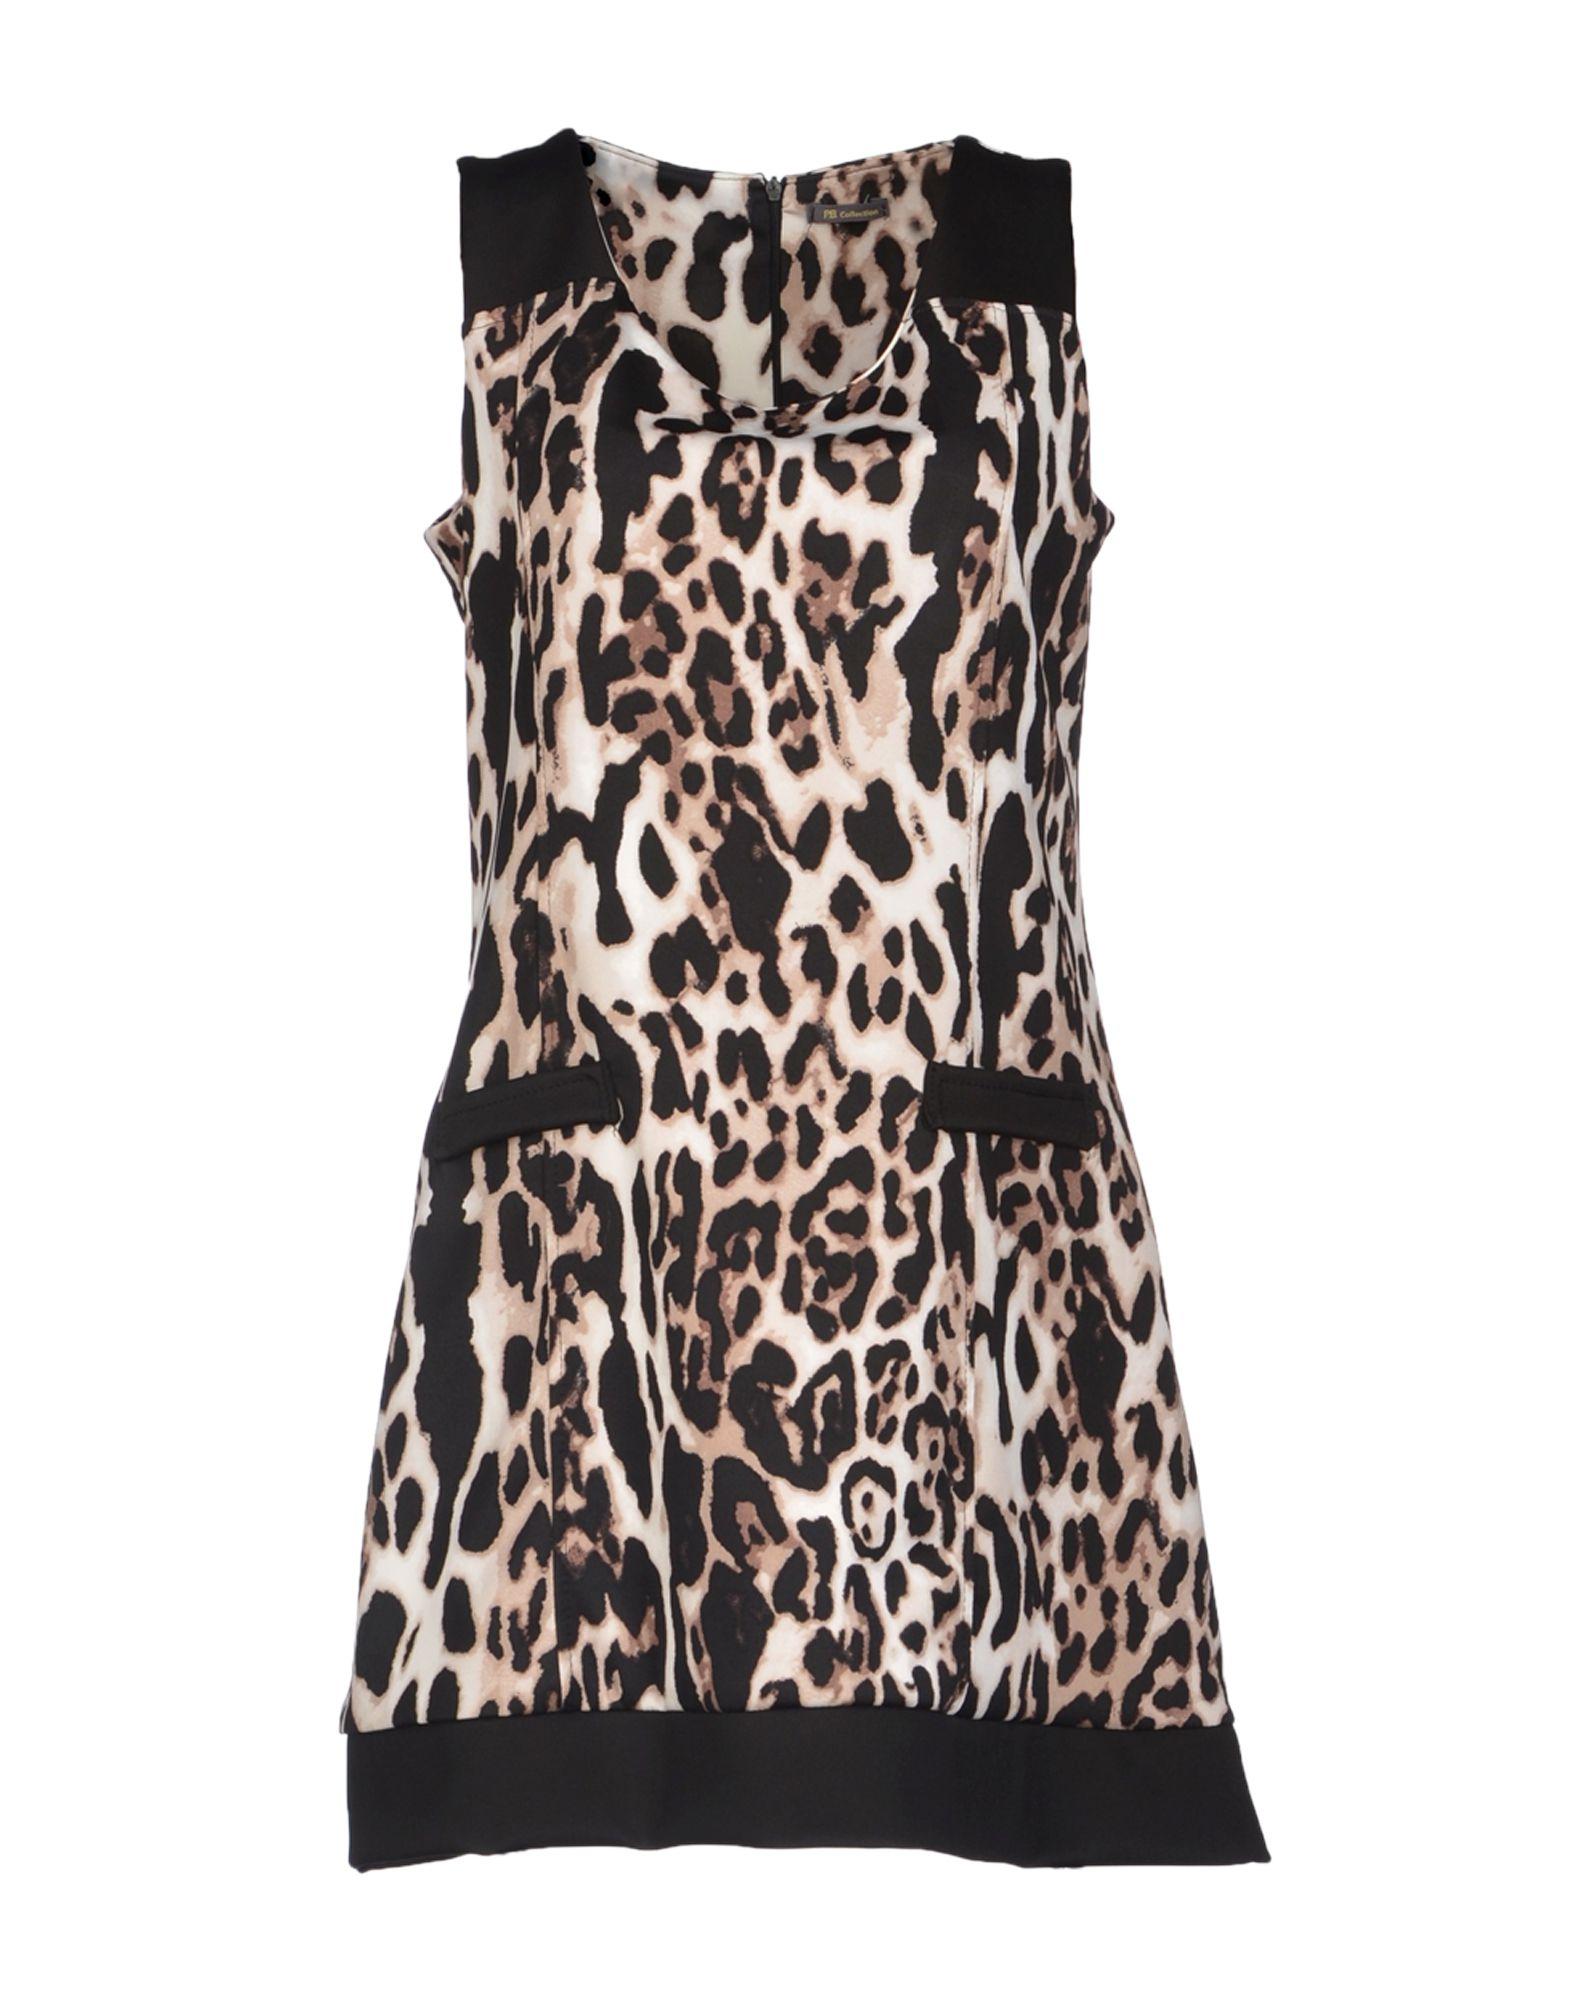 P.B. COLLECTION Short dresses